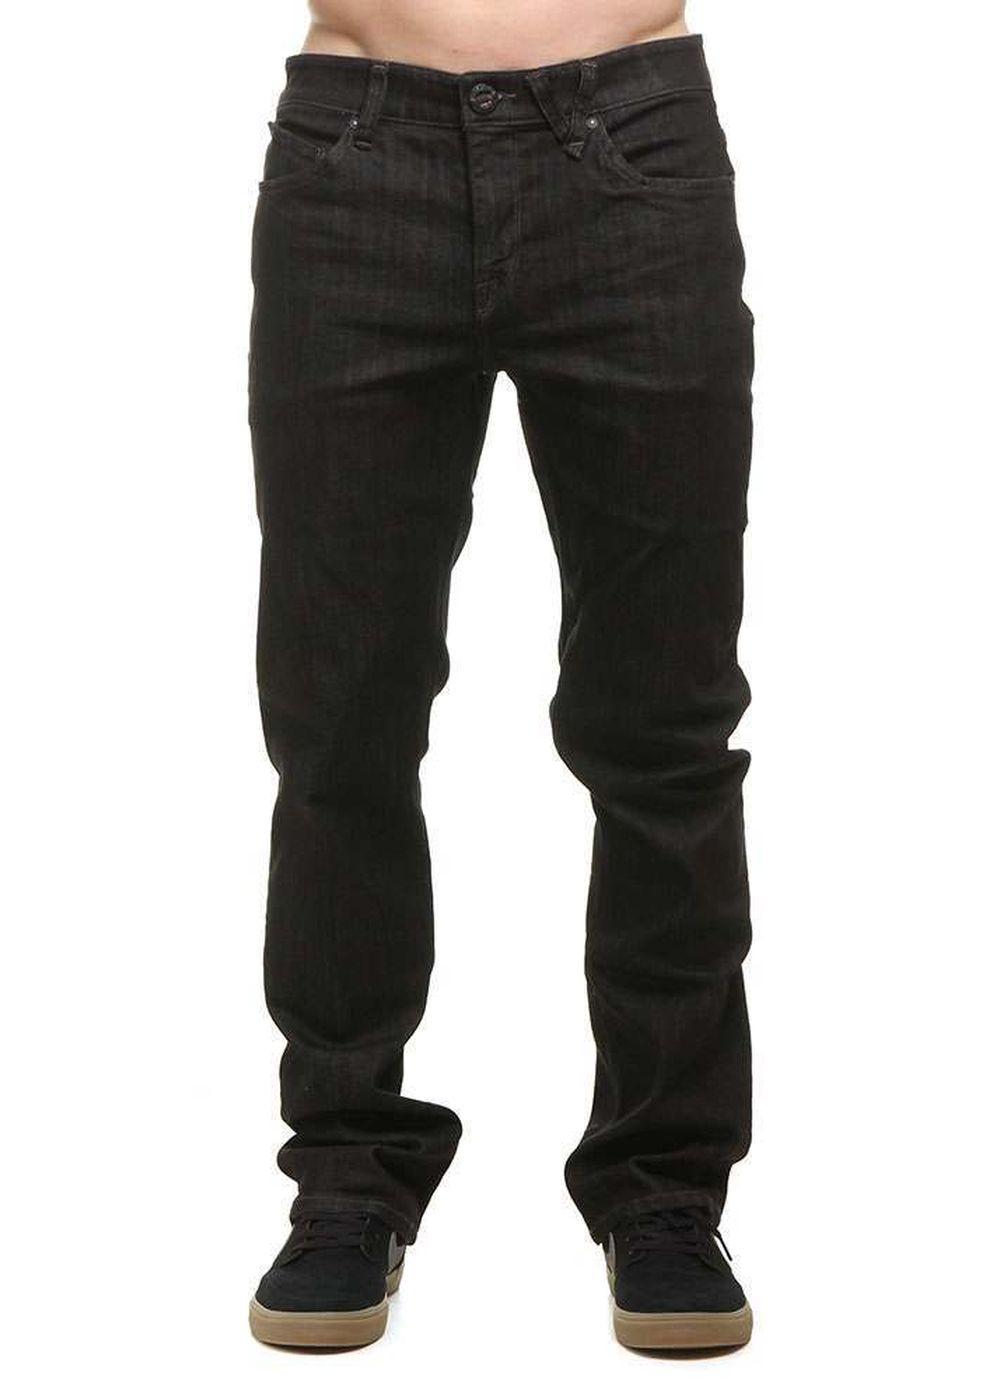 volcom-solver-jeans-black-rinse